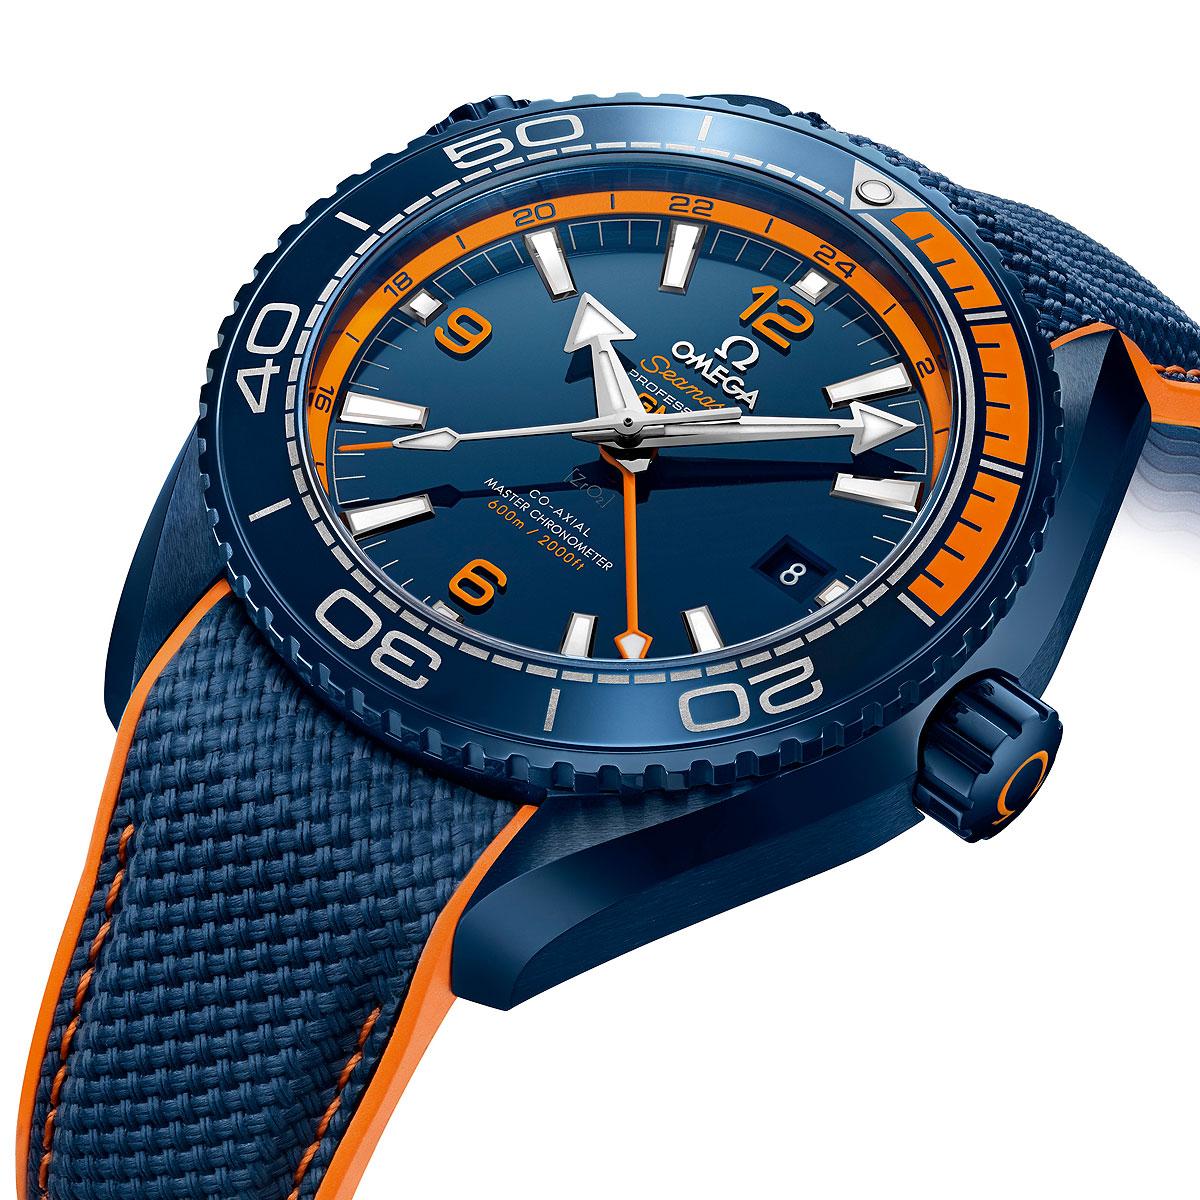 Omega Seamaster Planet Ocean Big Blue Watchtime